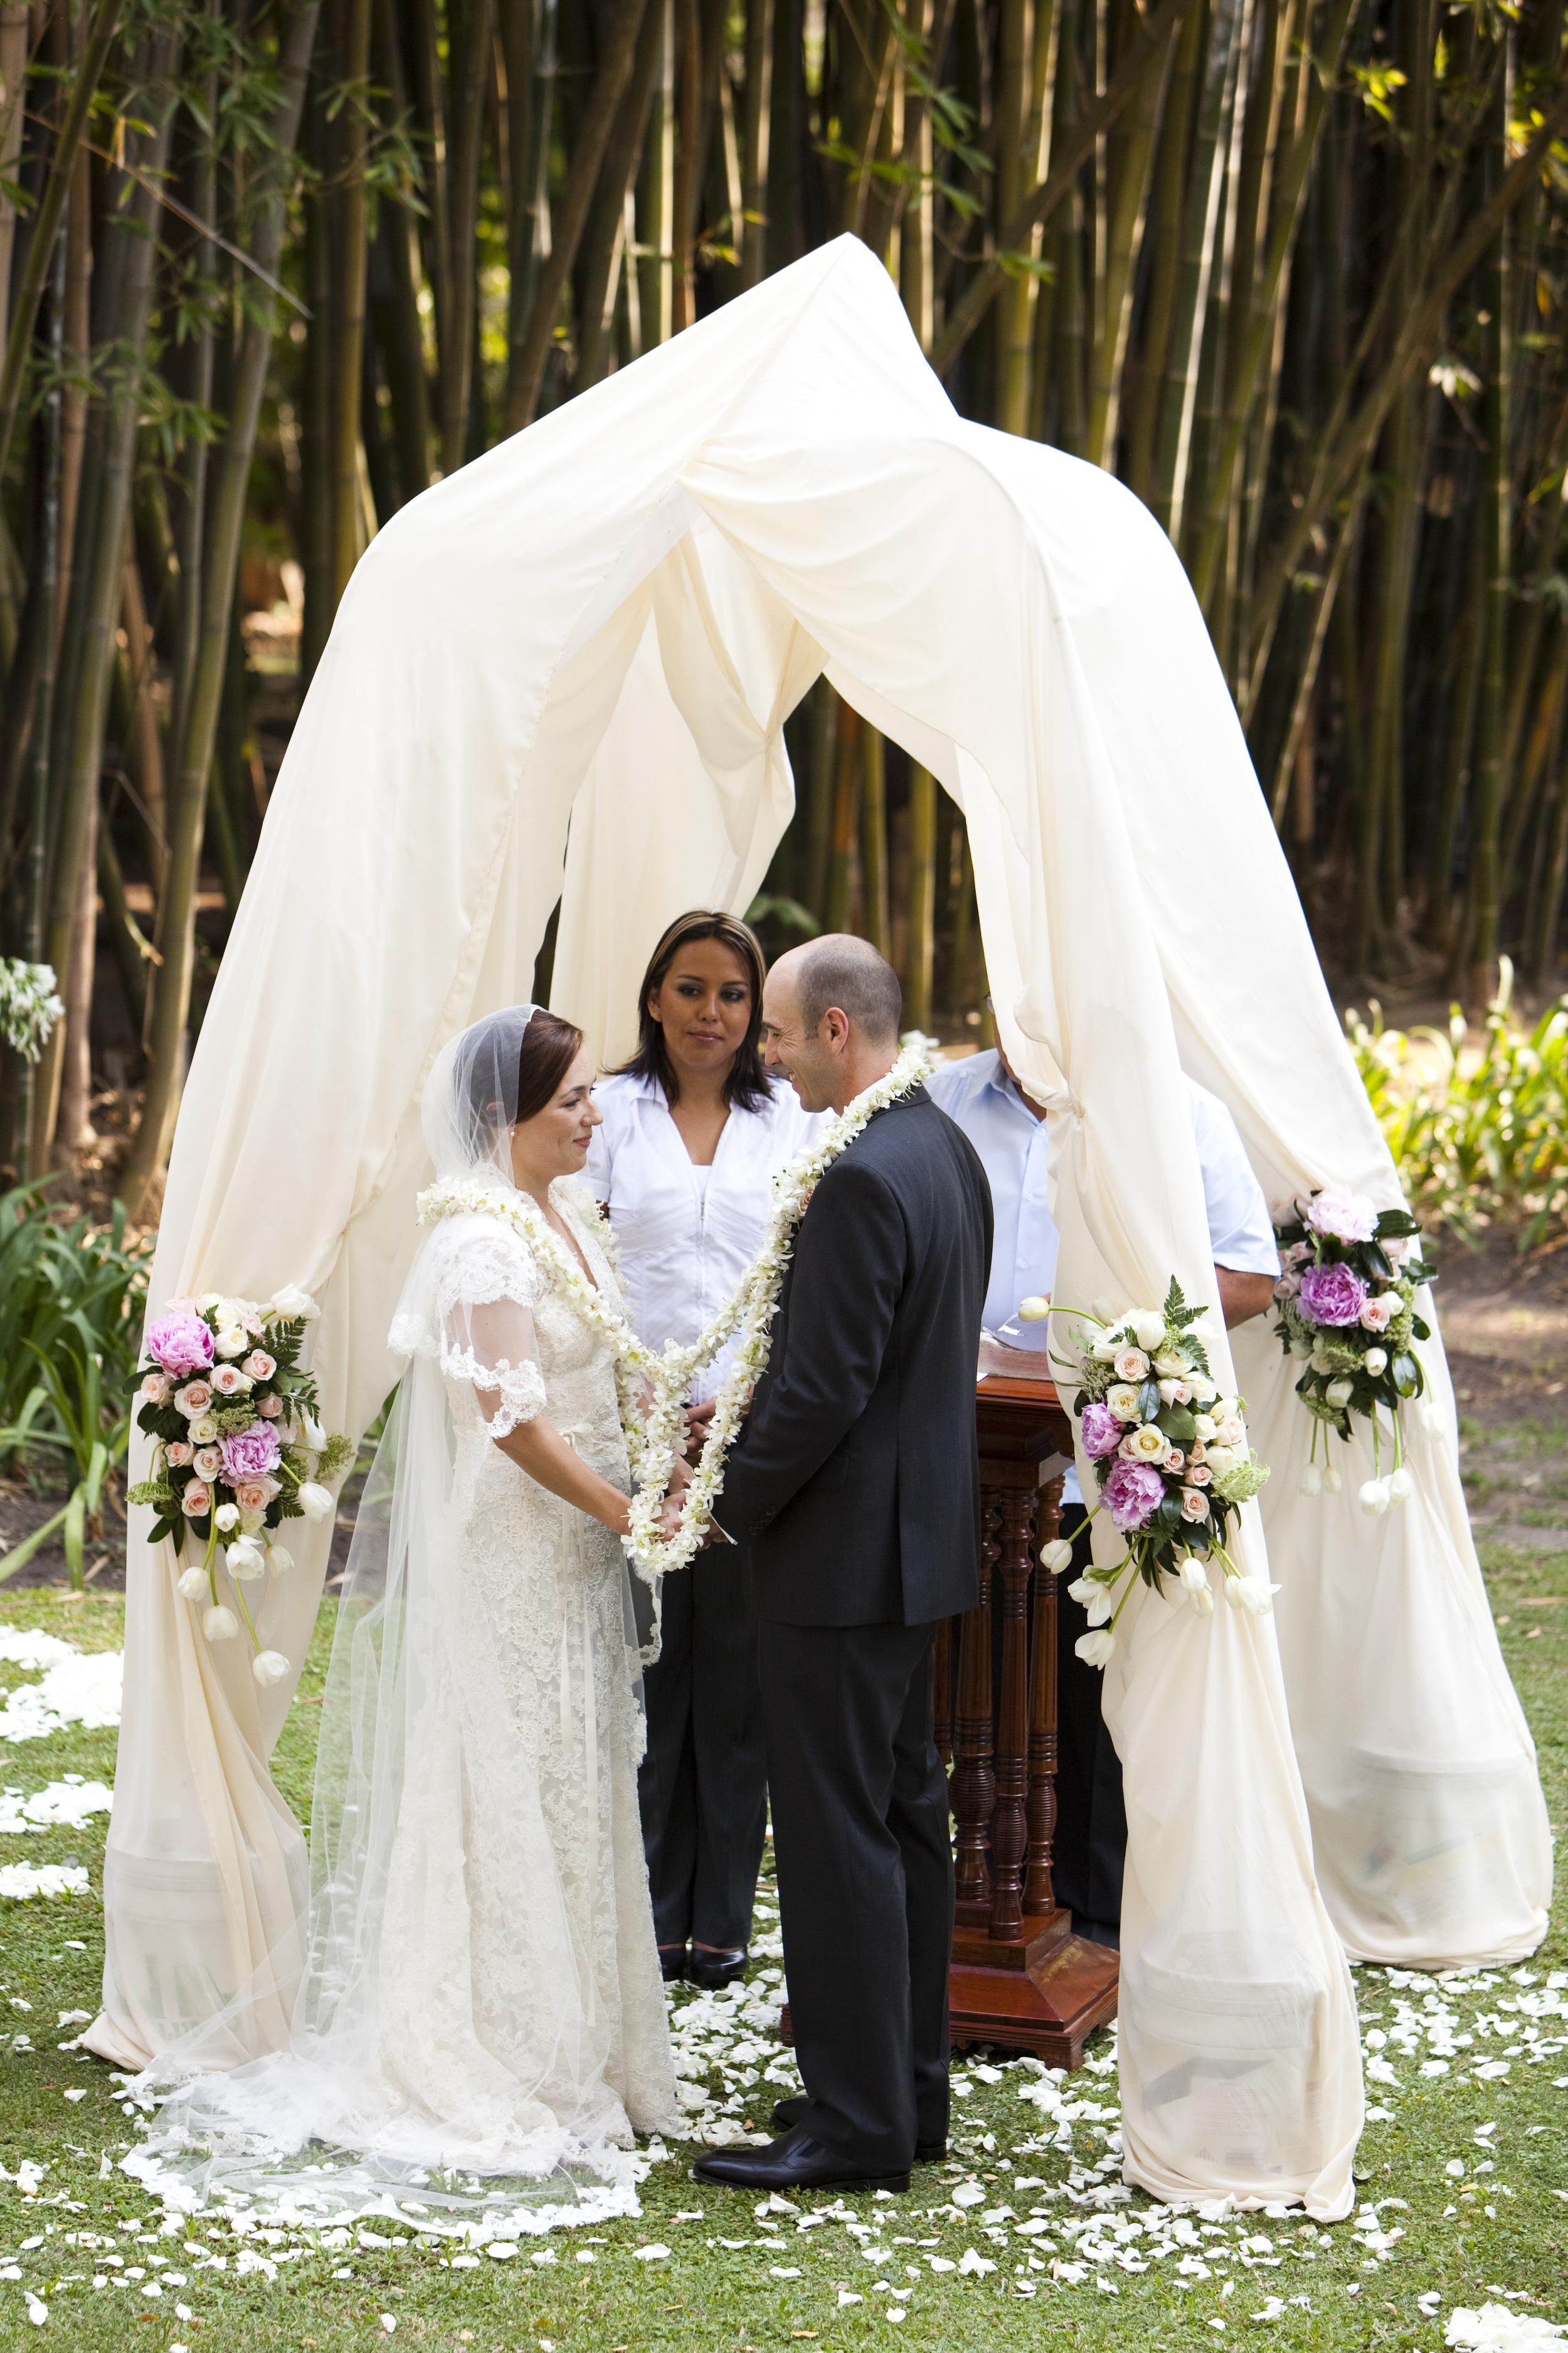 Ceci_New_York_Style_Luxury_Custom_Mexico_Wedding_CeciBride_Letterpress_NewYork_Foil_Hacienda_de_San_Antonio_22.jpg